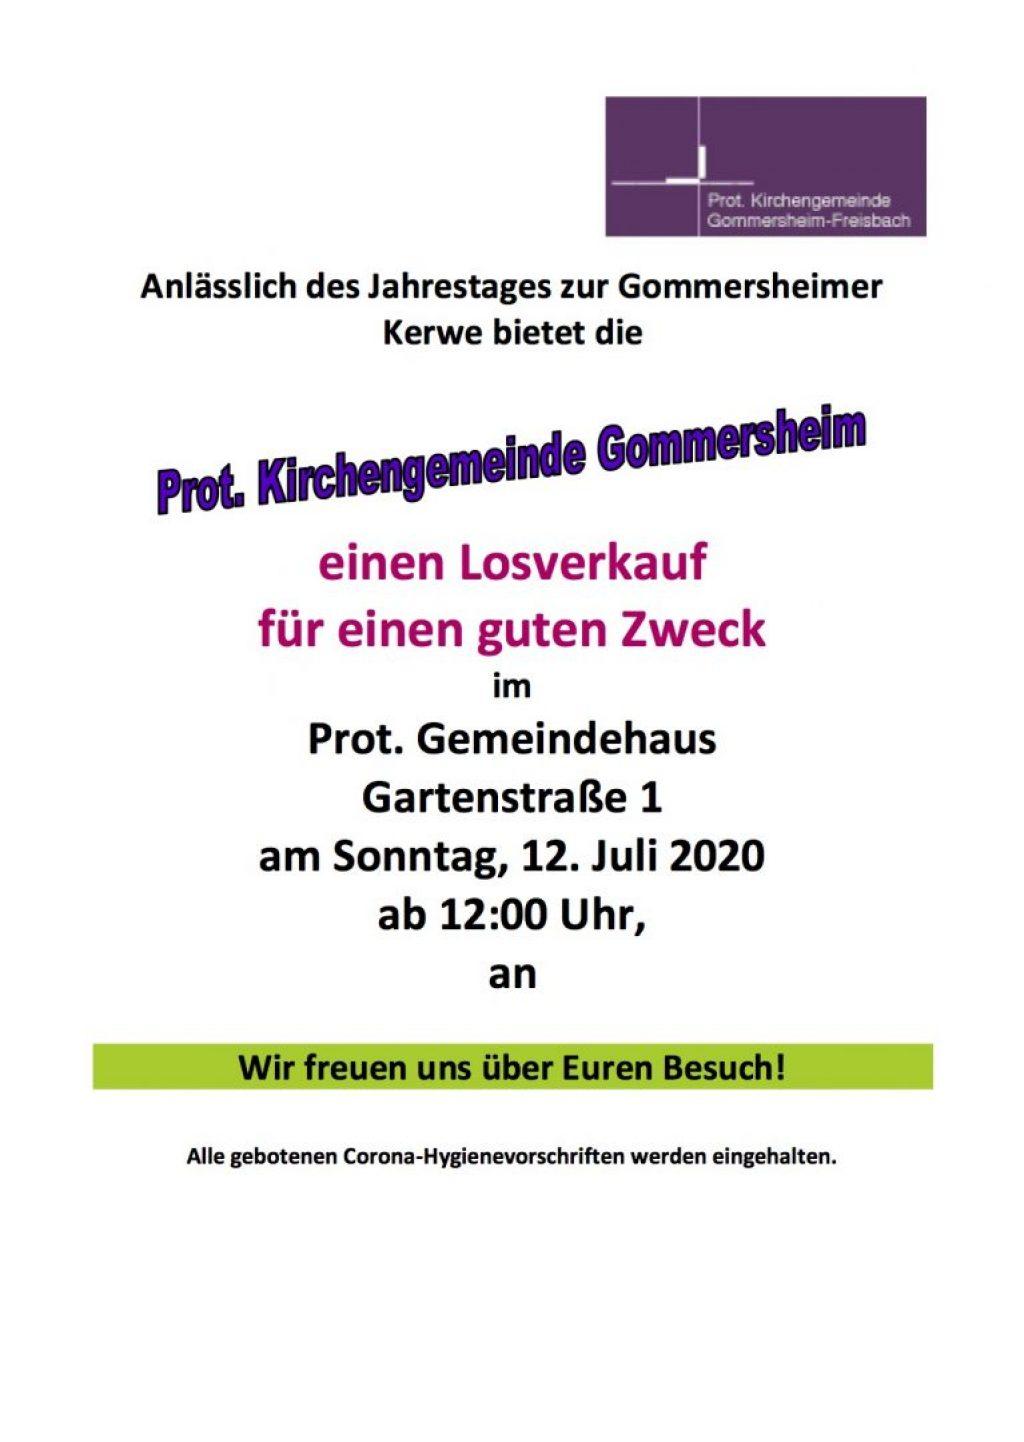 200702_Flyer Prot. Kircheng.